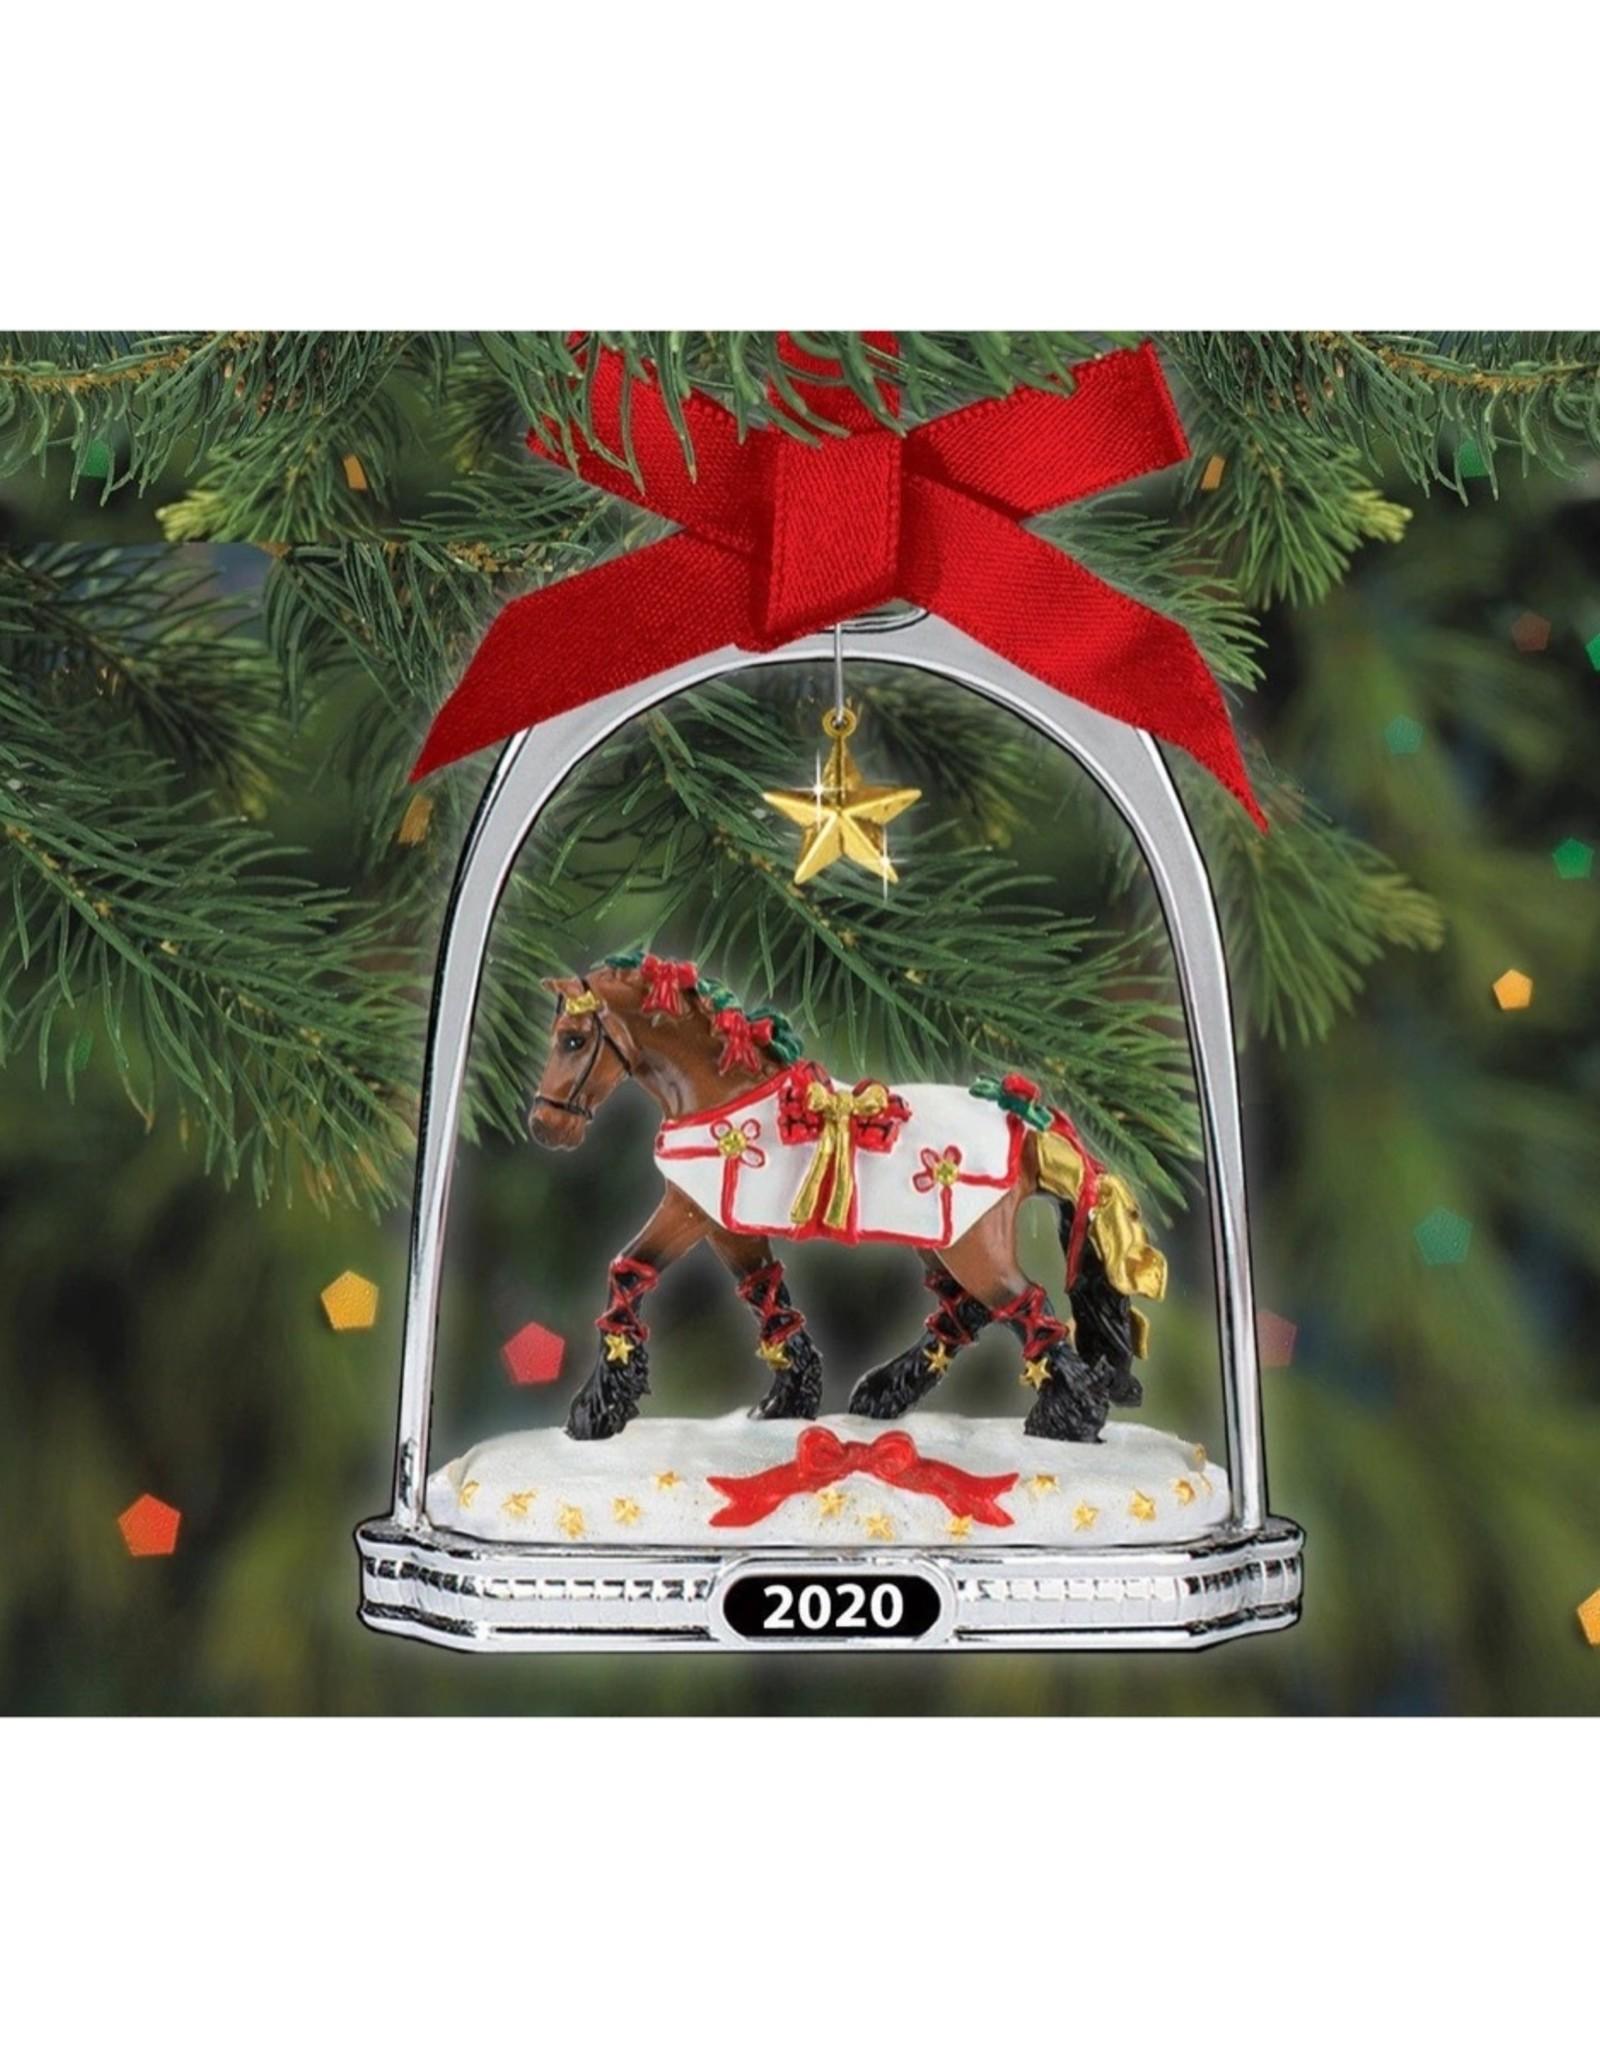 Breyer Yuletide Stirrup 2020 Ornament